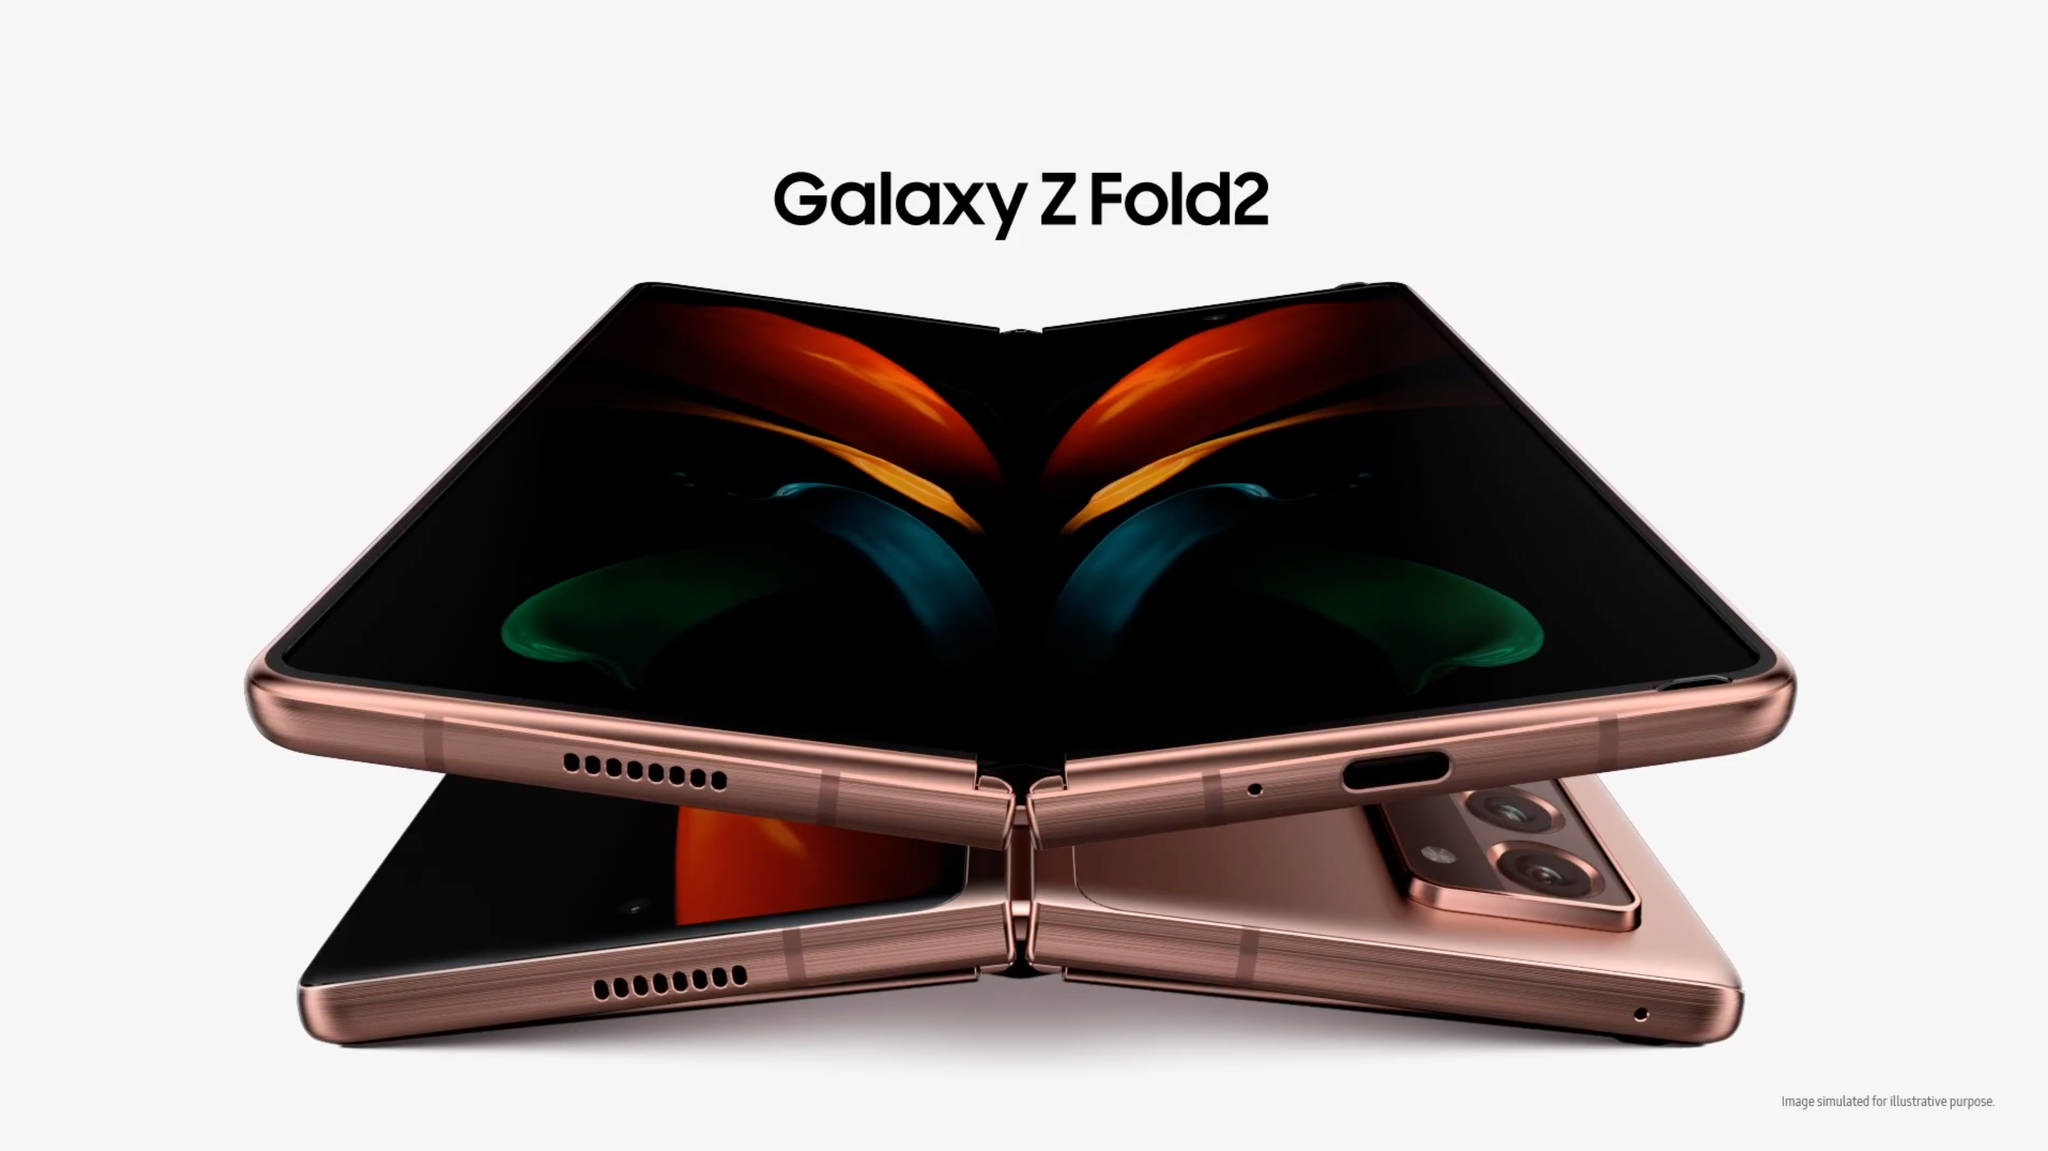 Samsung Galaxy Z Fold 2 Opened